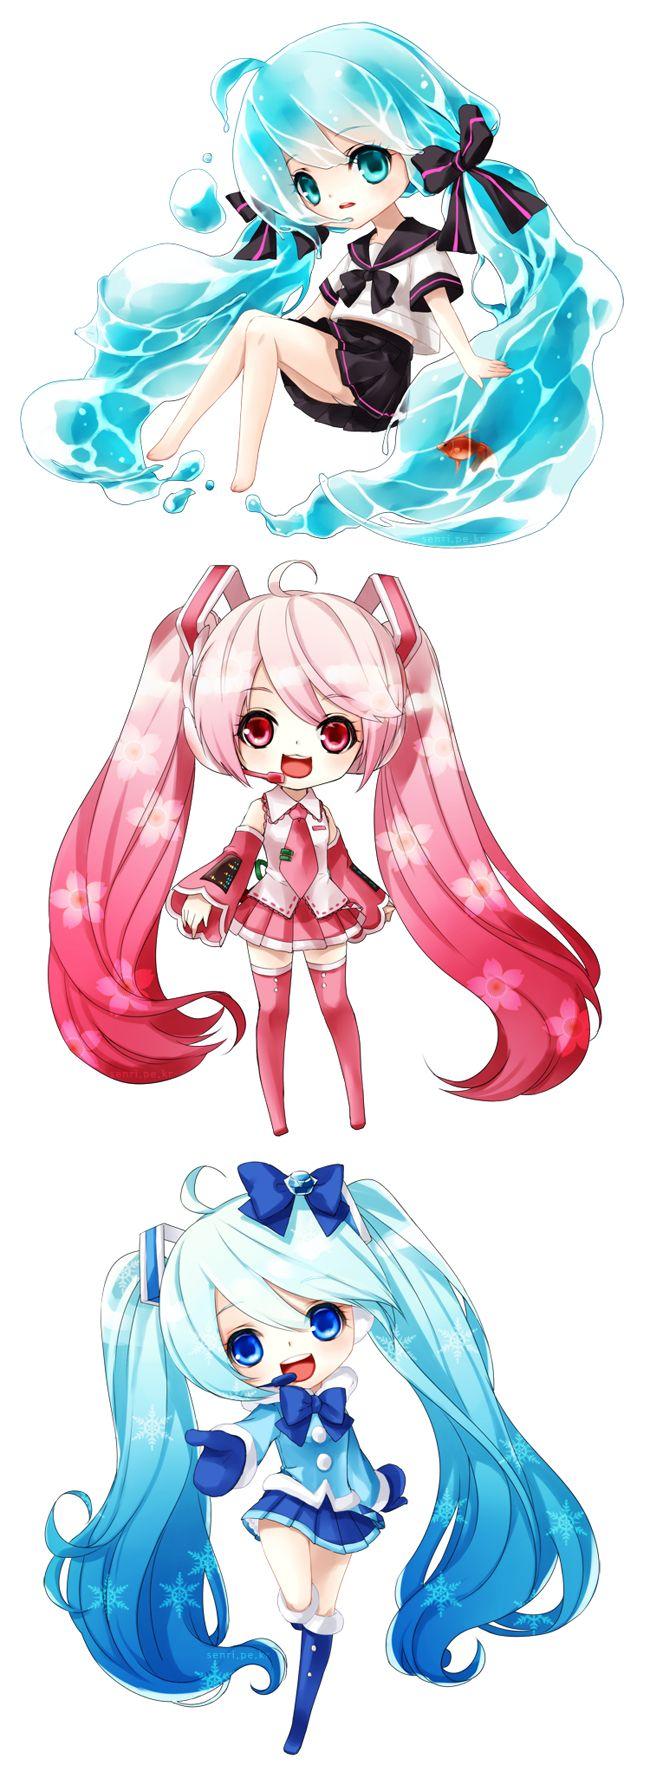 Summer Miku, Mizu Miku,Spring Miku, Sakura Miku, Winter Miku, and Yuki Miku (My favorite is Sakura Miku. ;) How about yours?)